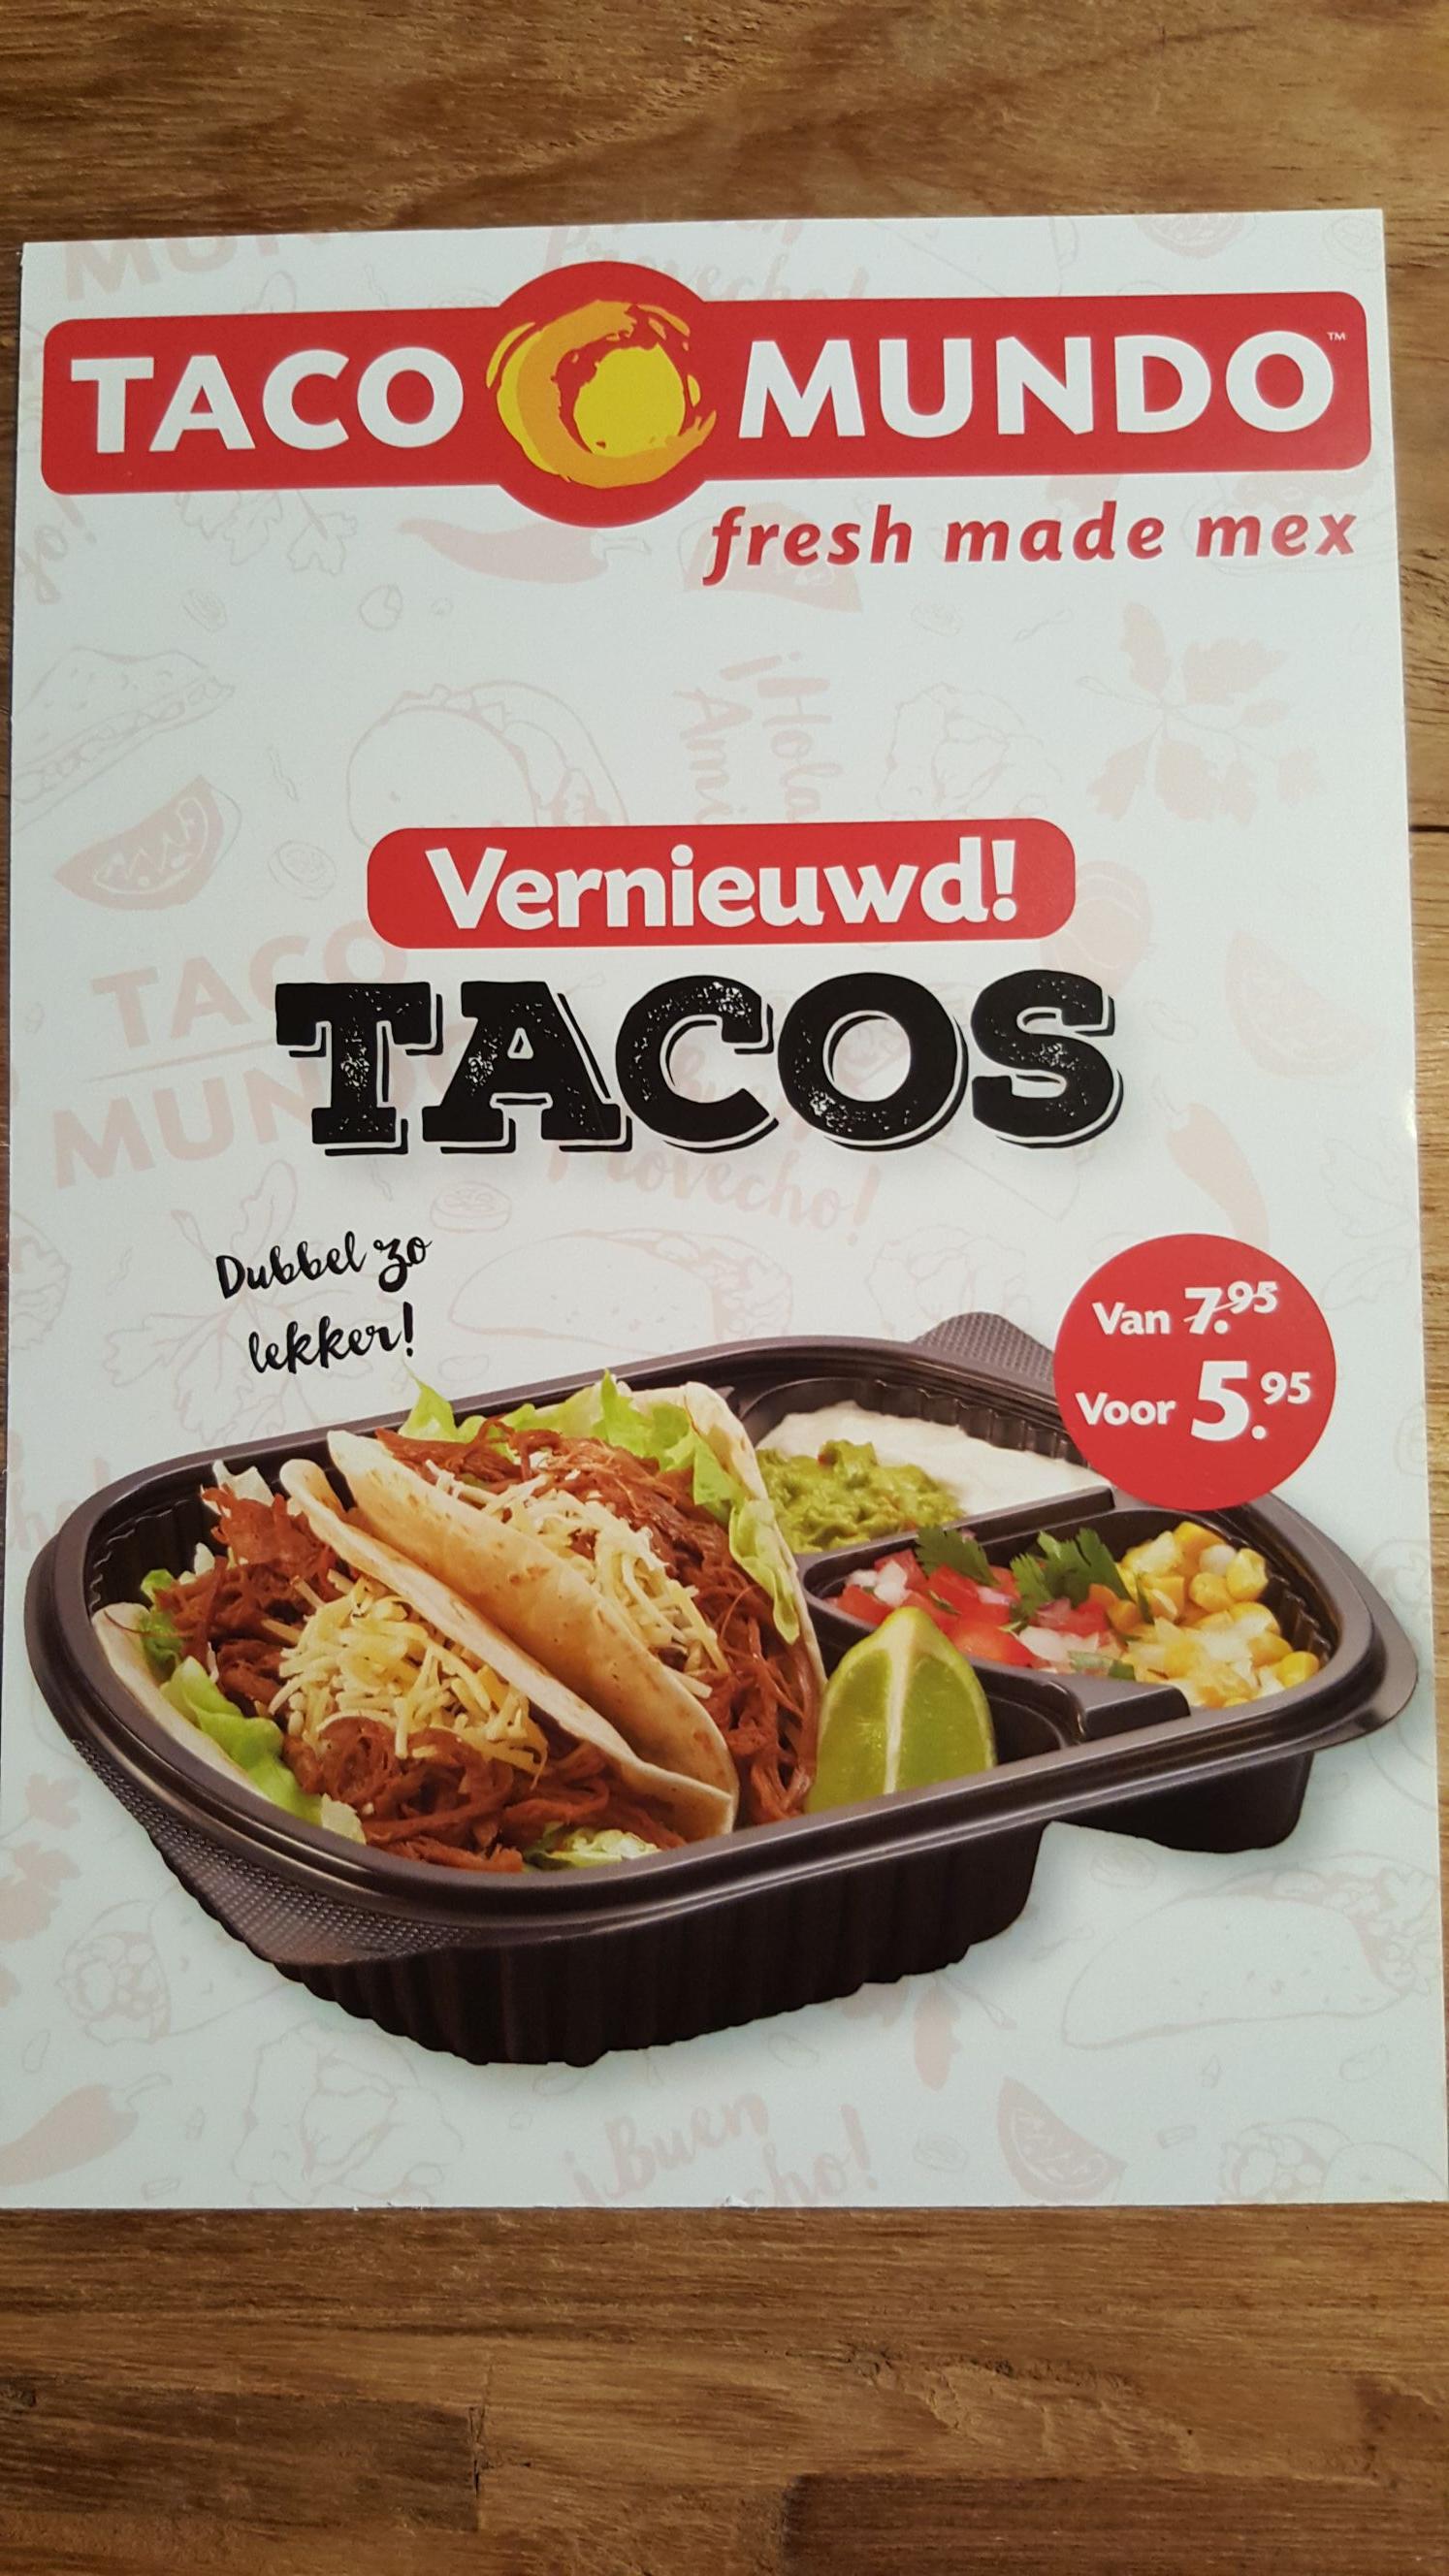 Korting op vernieuwde taco's bij Tacomundo